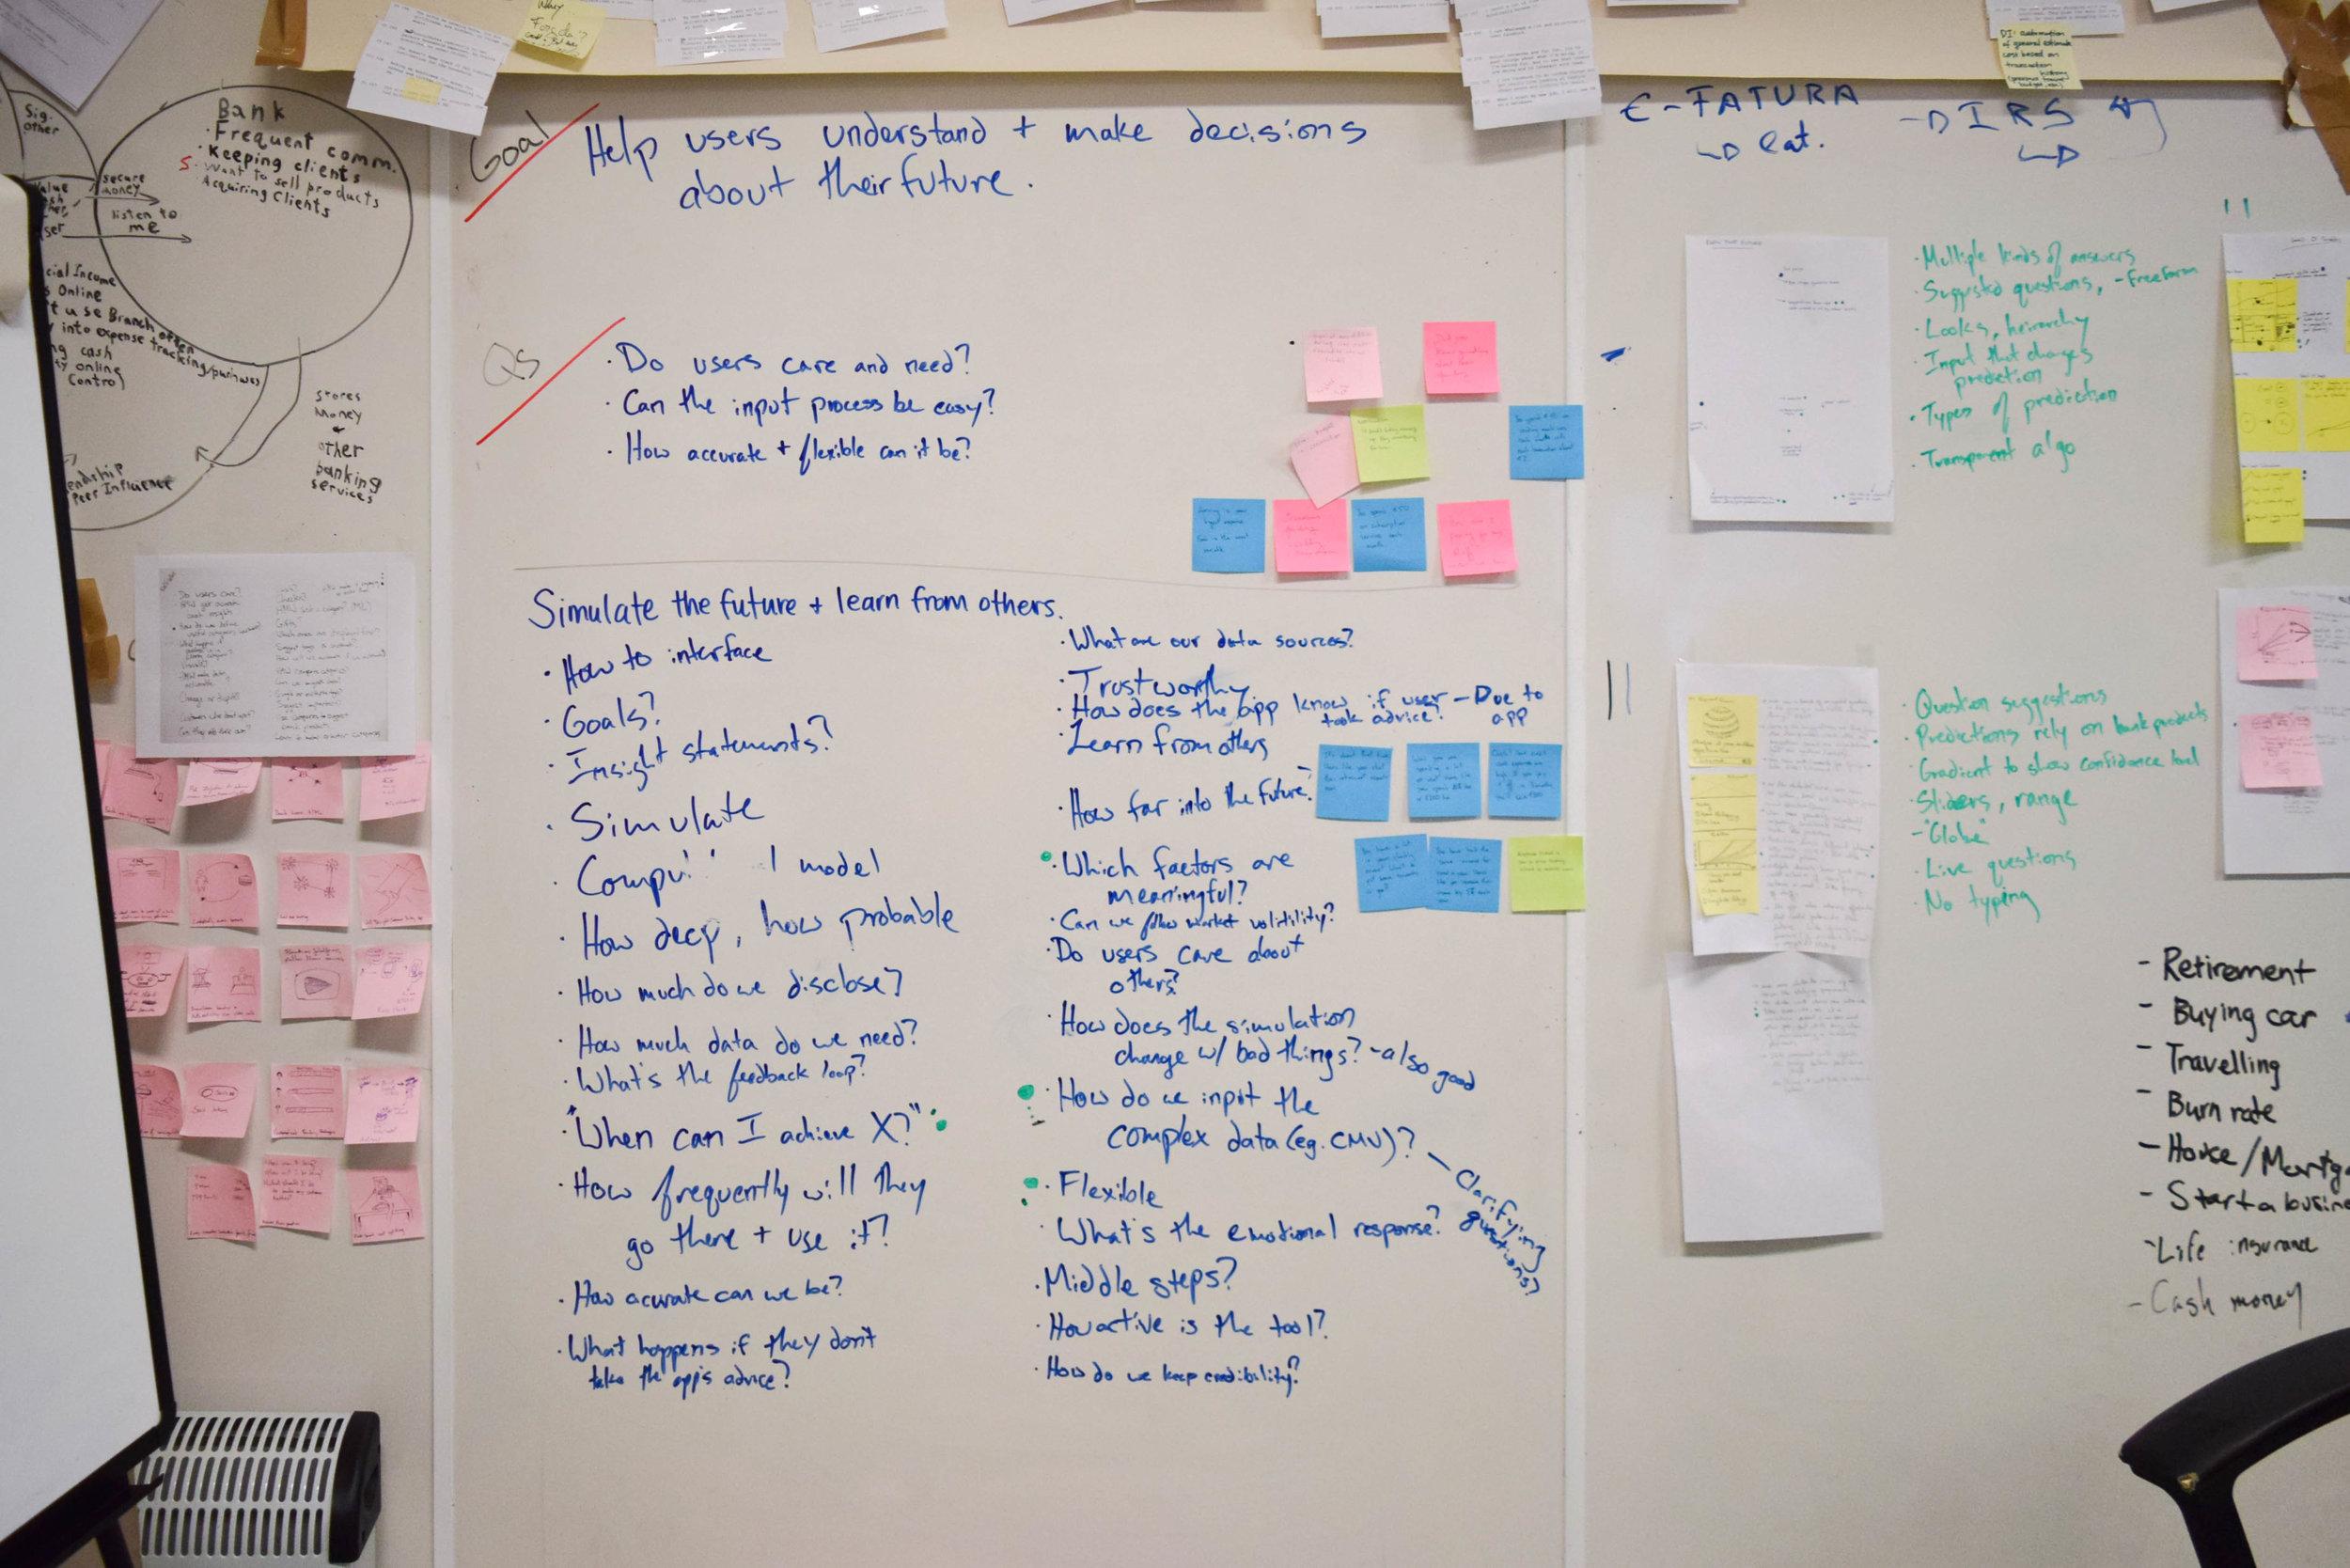 Stating Goals & Questions